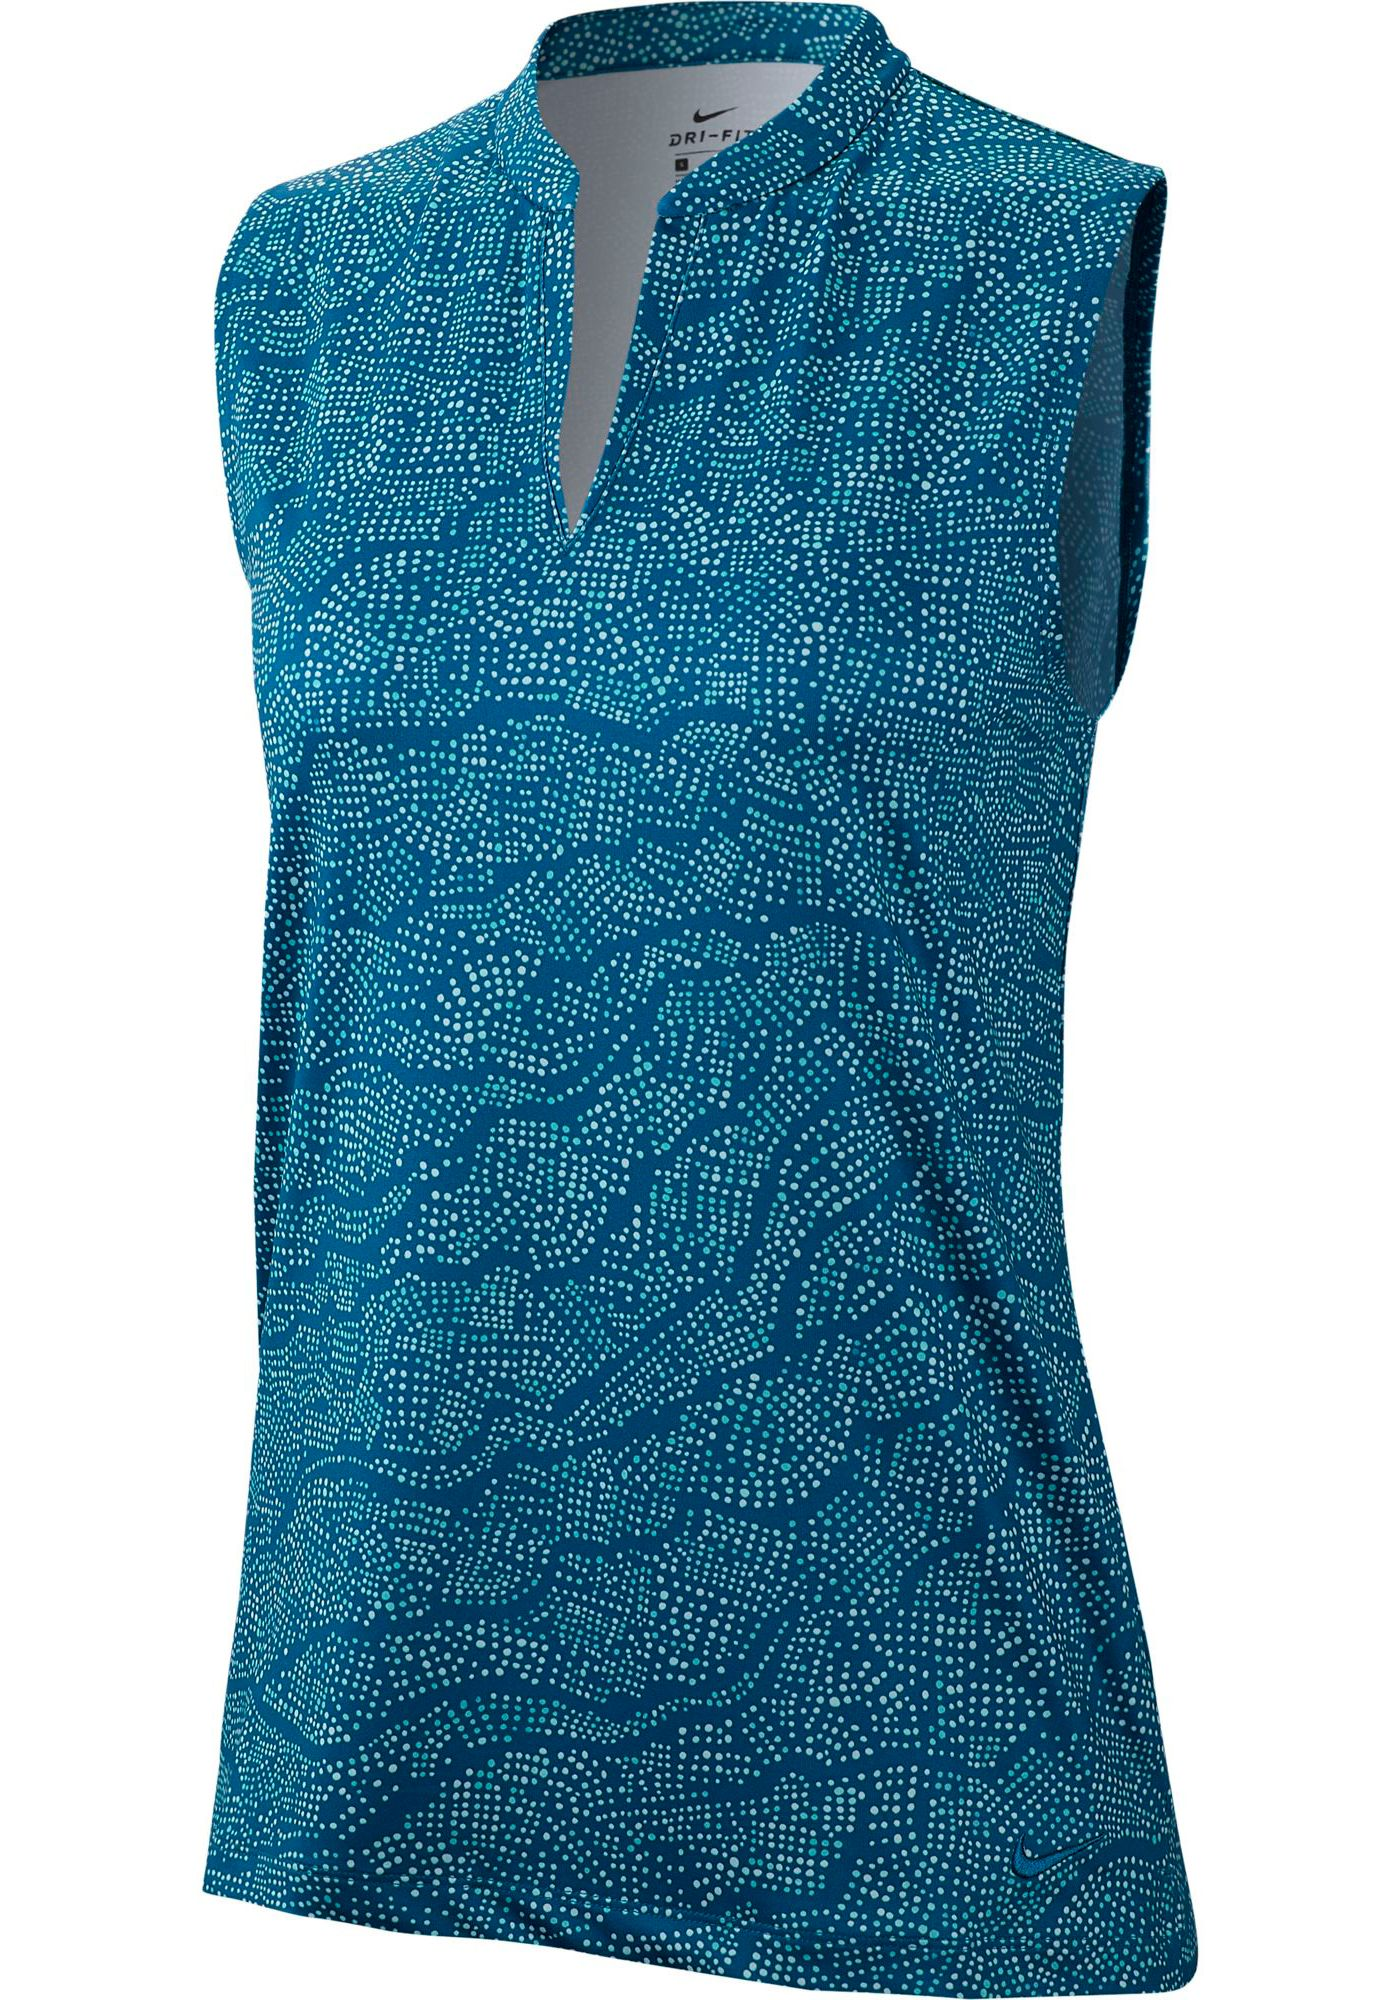 Nike Women's Dri-FIT UV Printed Sleeveless Golf Polo